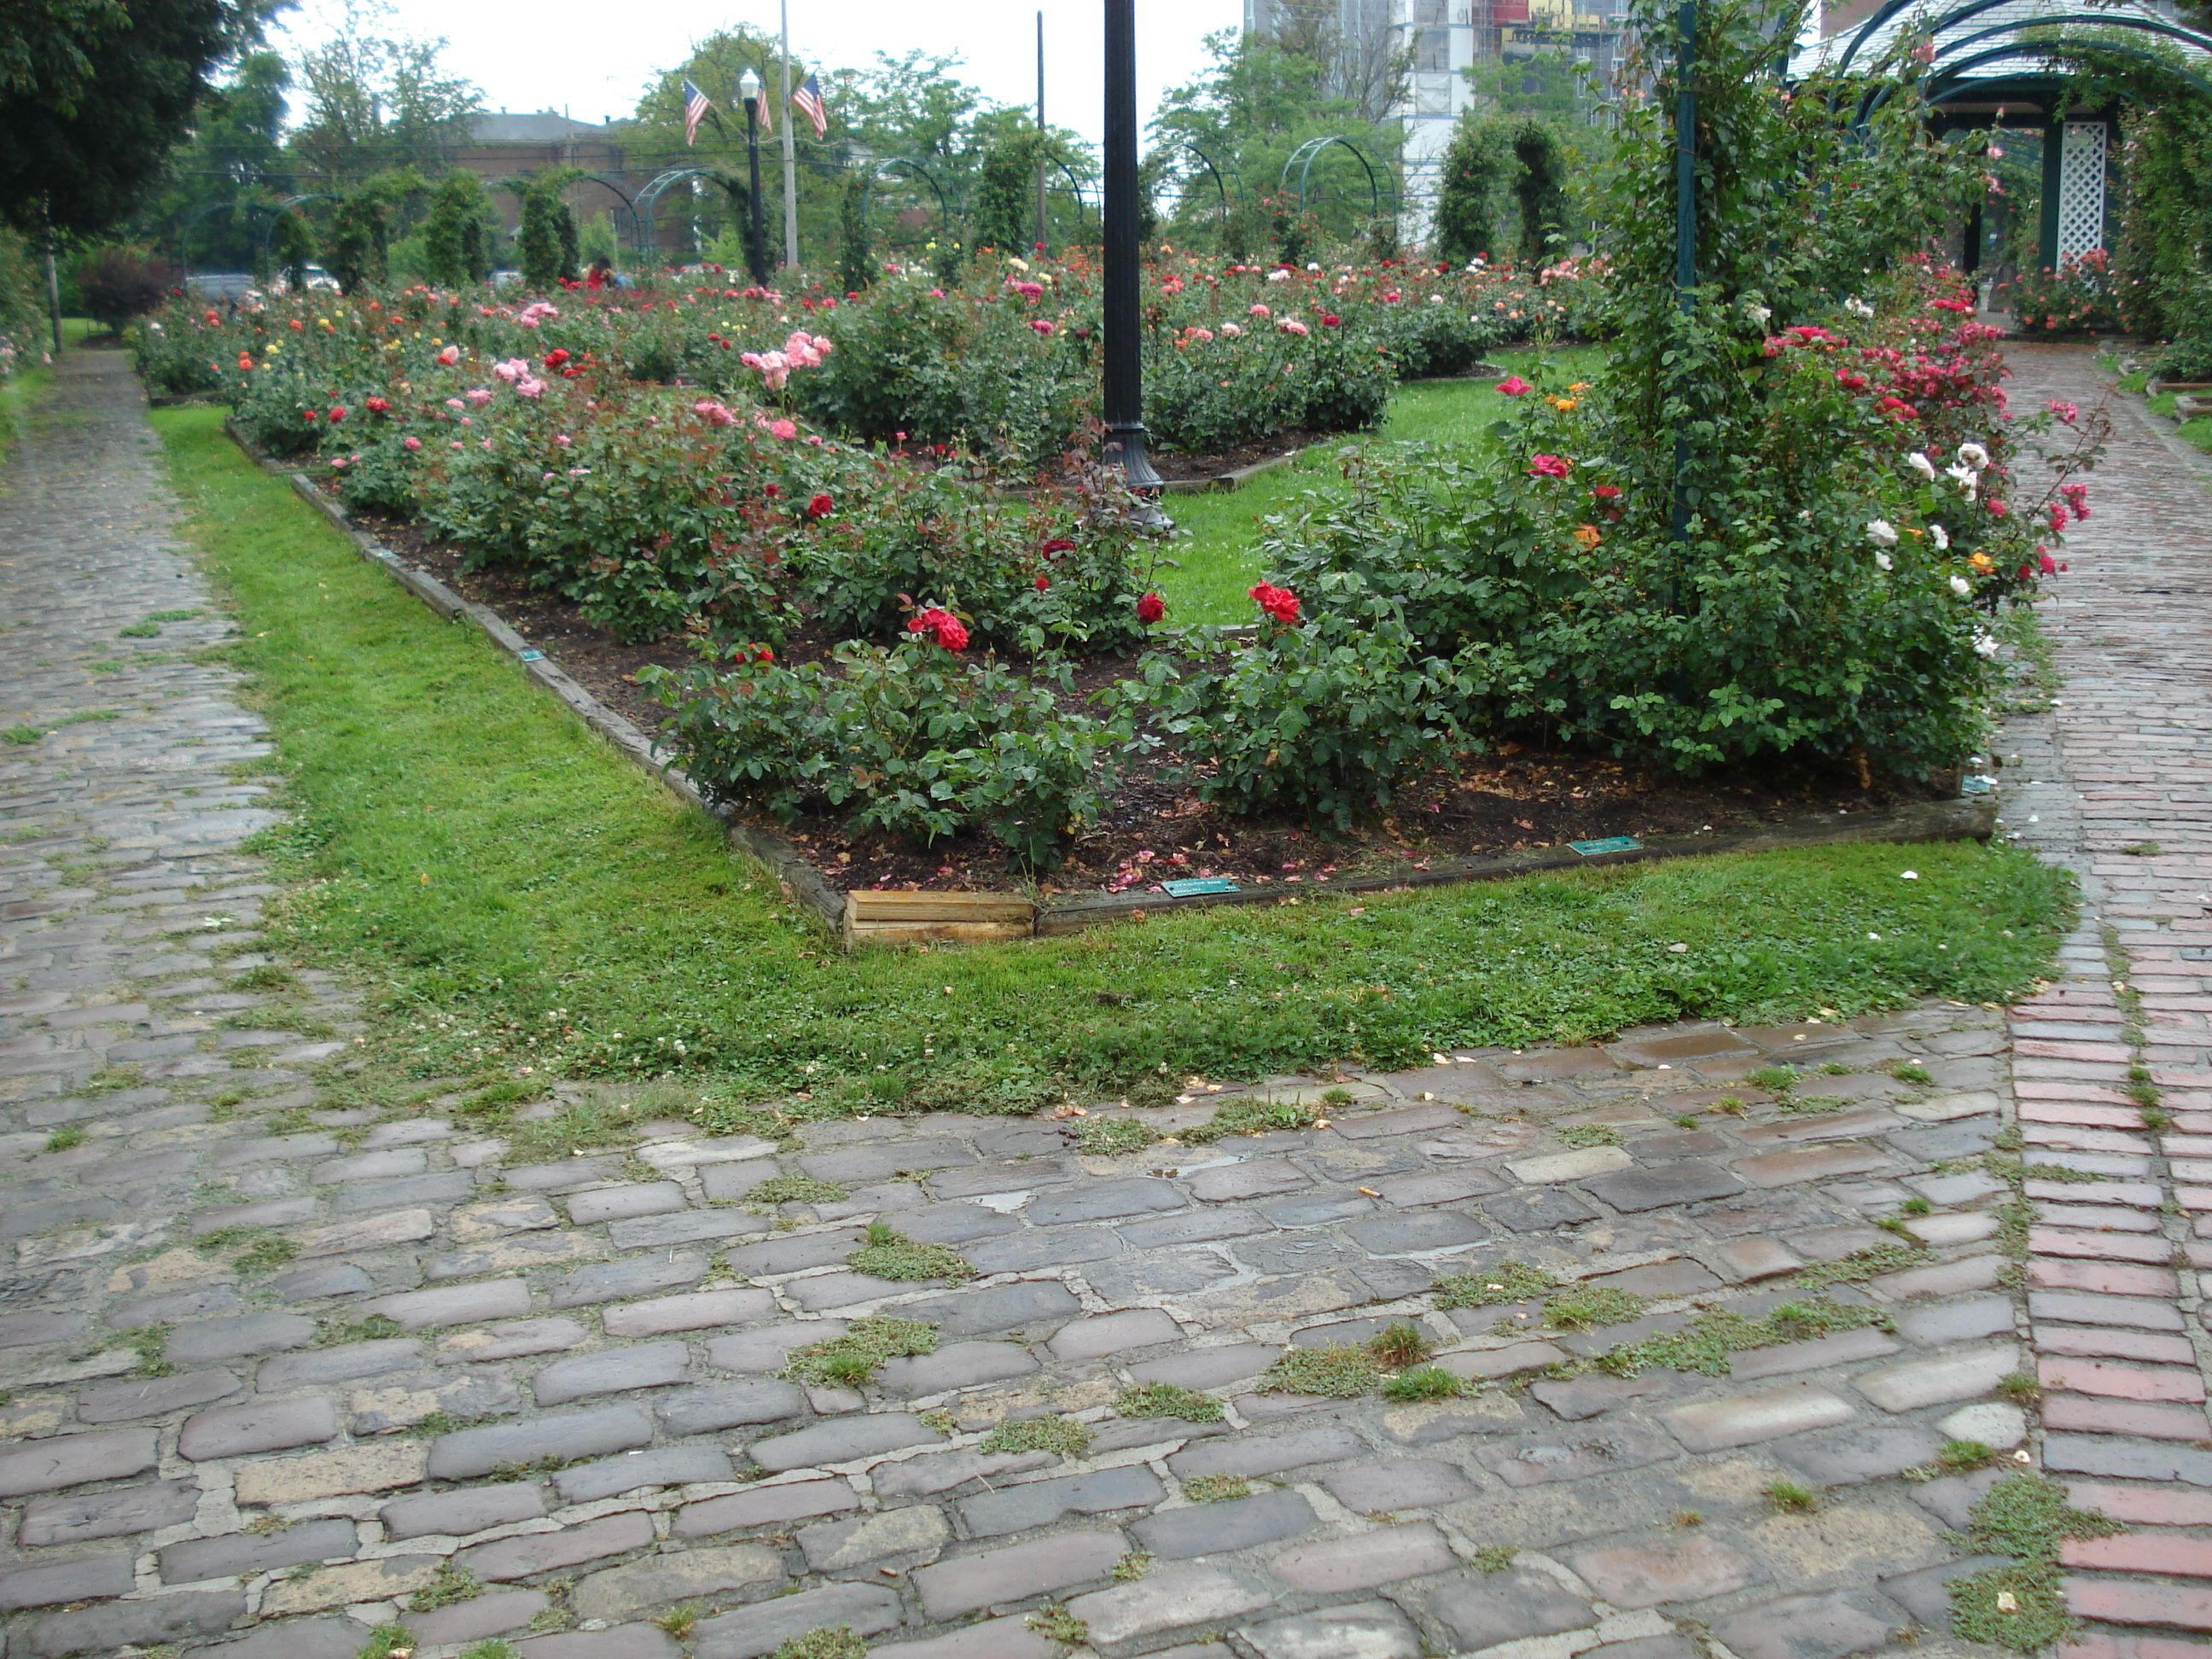 Dr. E.M. Mills Rose Garden is located in Thornden Park ...